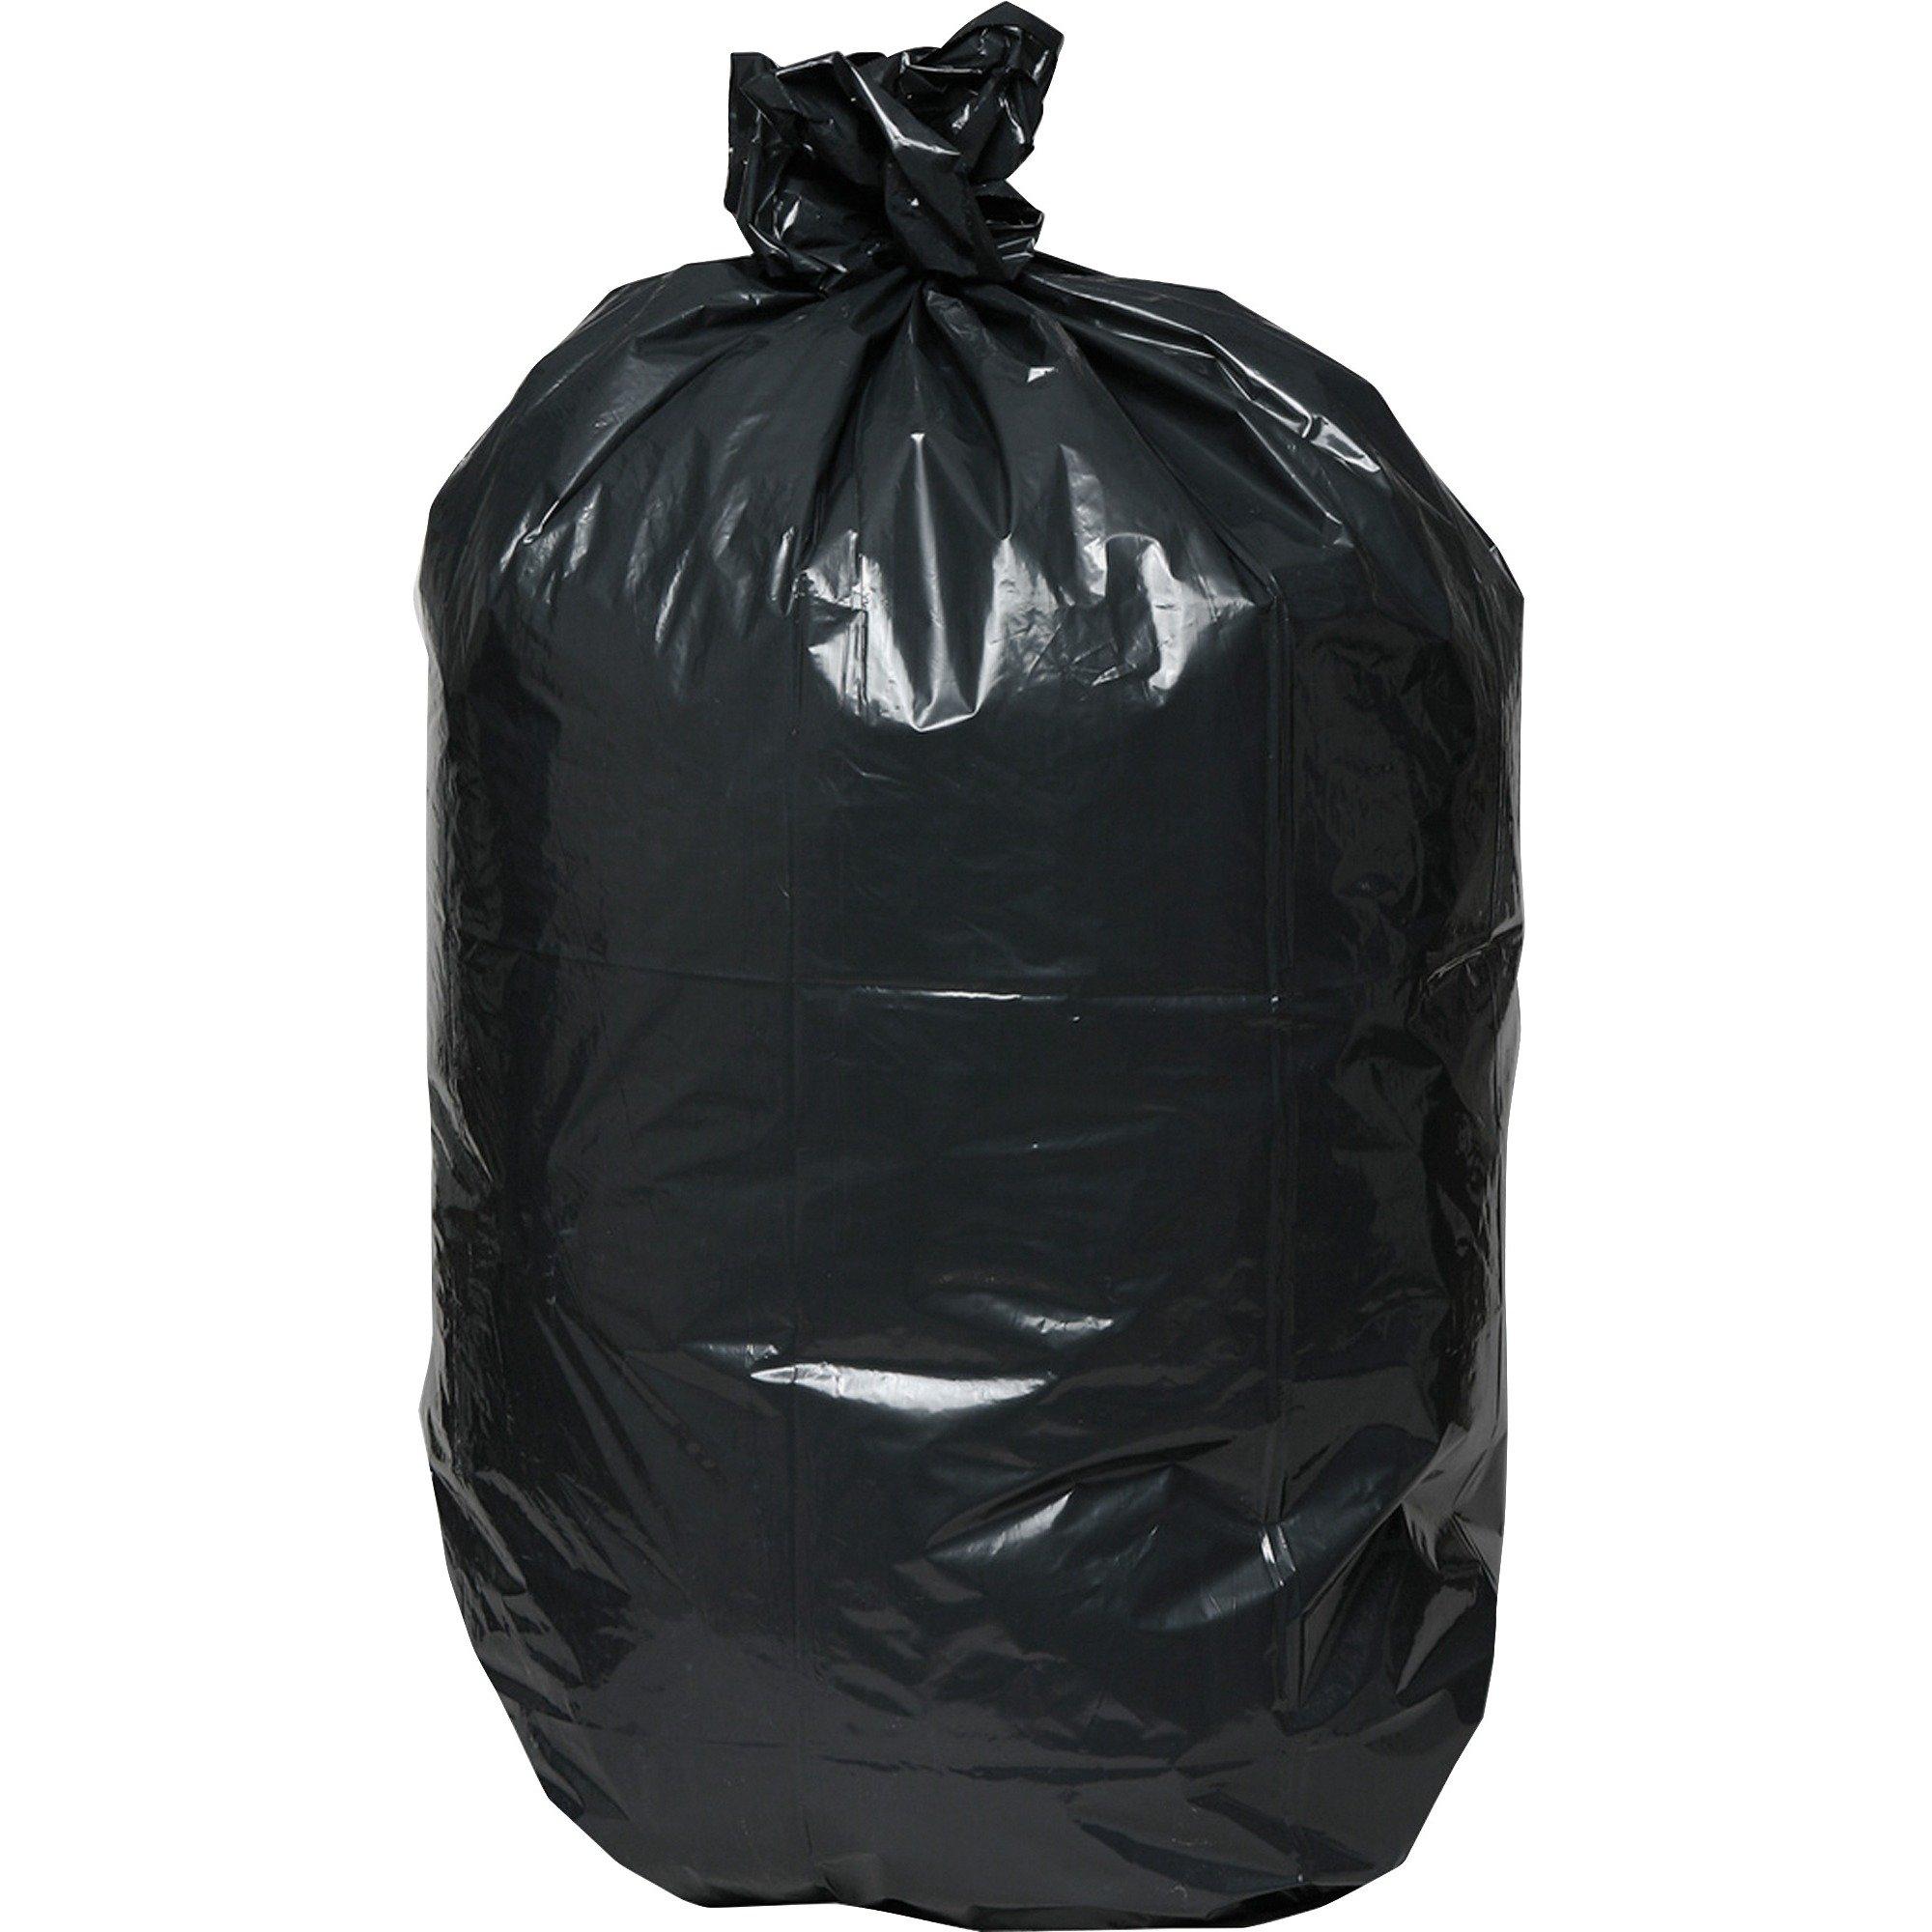 GJO01533 - Genuine Joe Heavy Duty Trash Bag by Genuine Joe (Image #1)